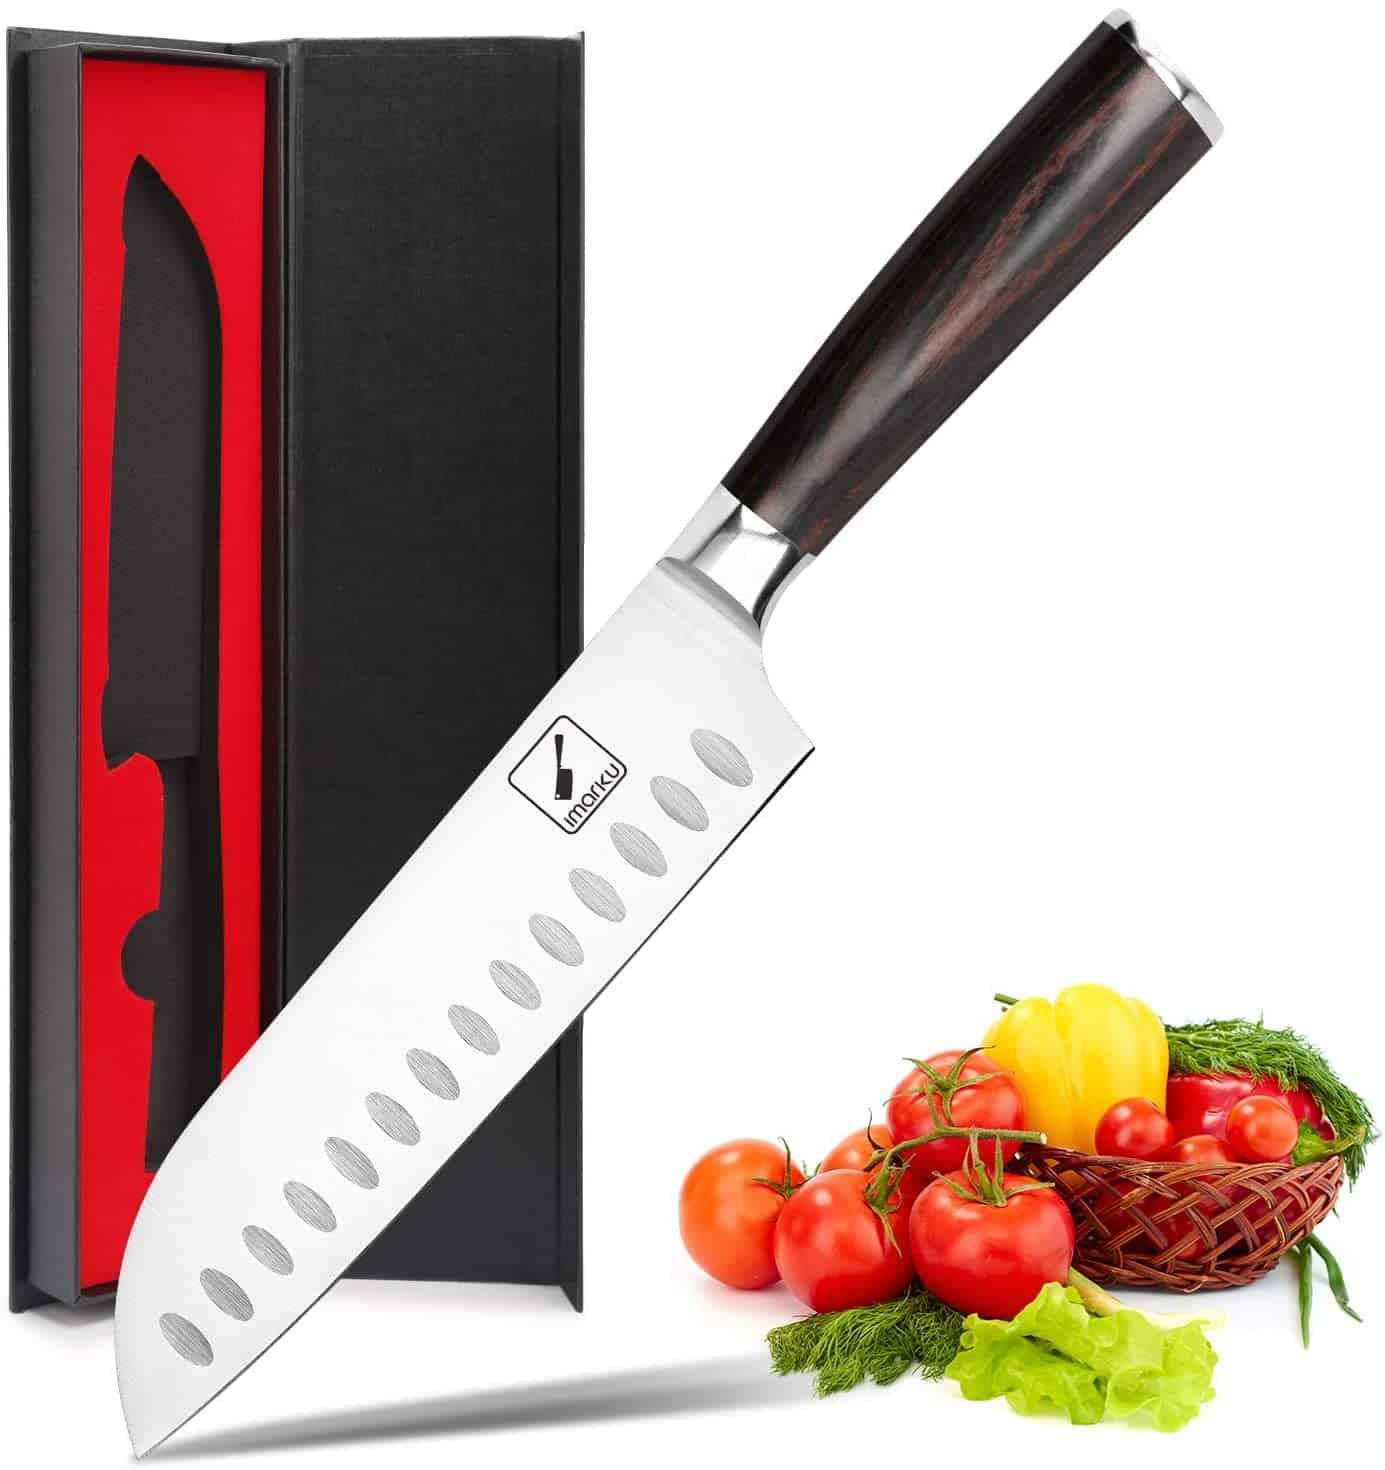 Image of sharp knife